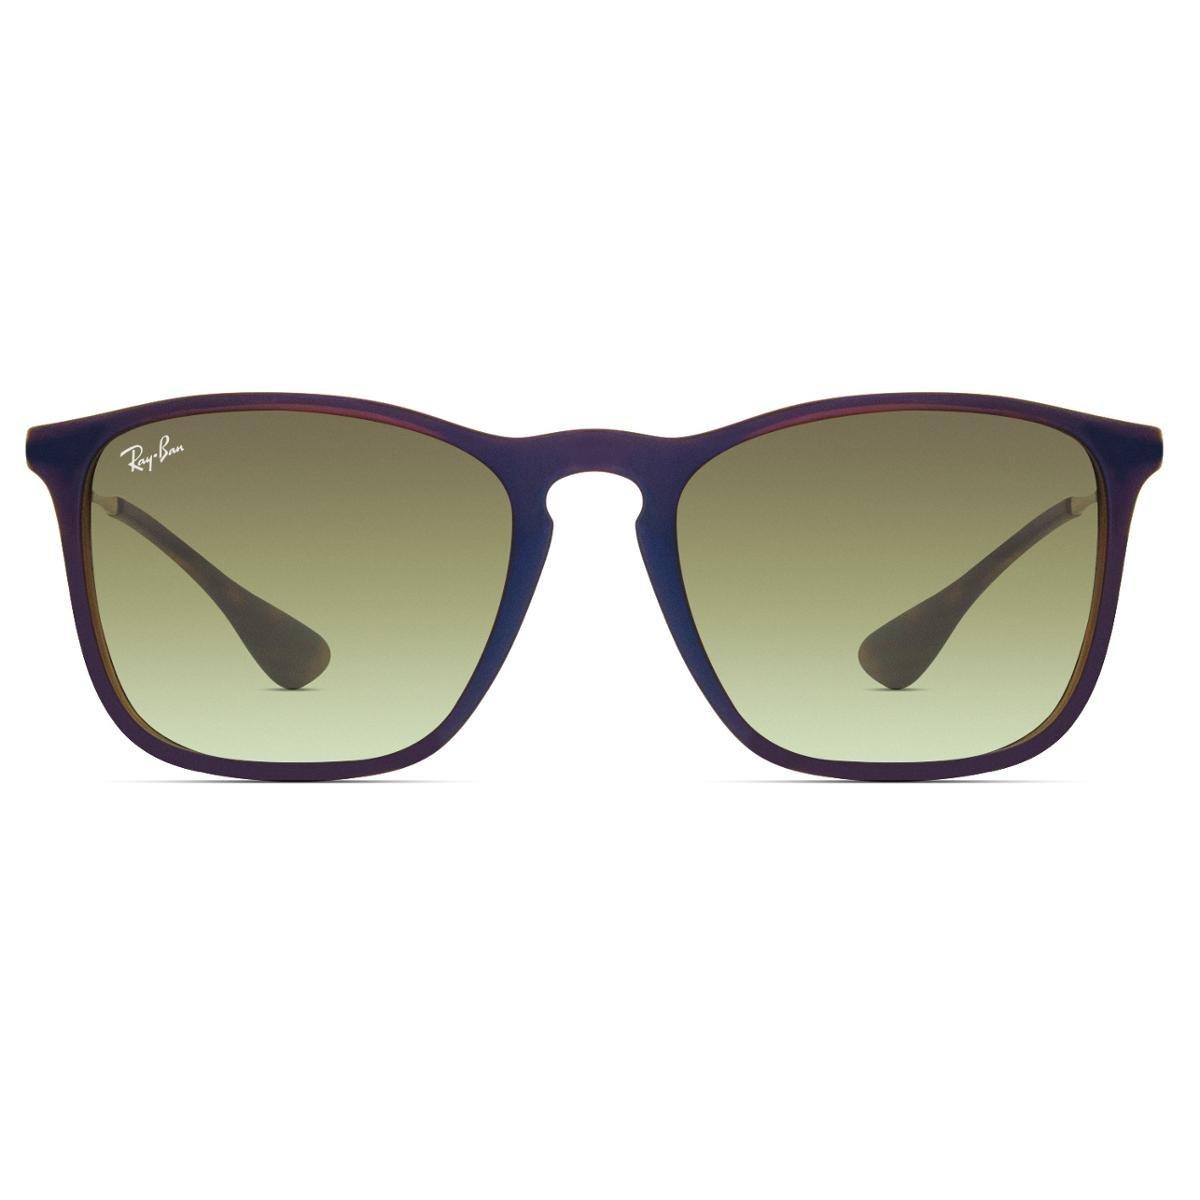 960c3b8561 Óculos de Sol Oakley Holbrook Metal - Compre Agora